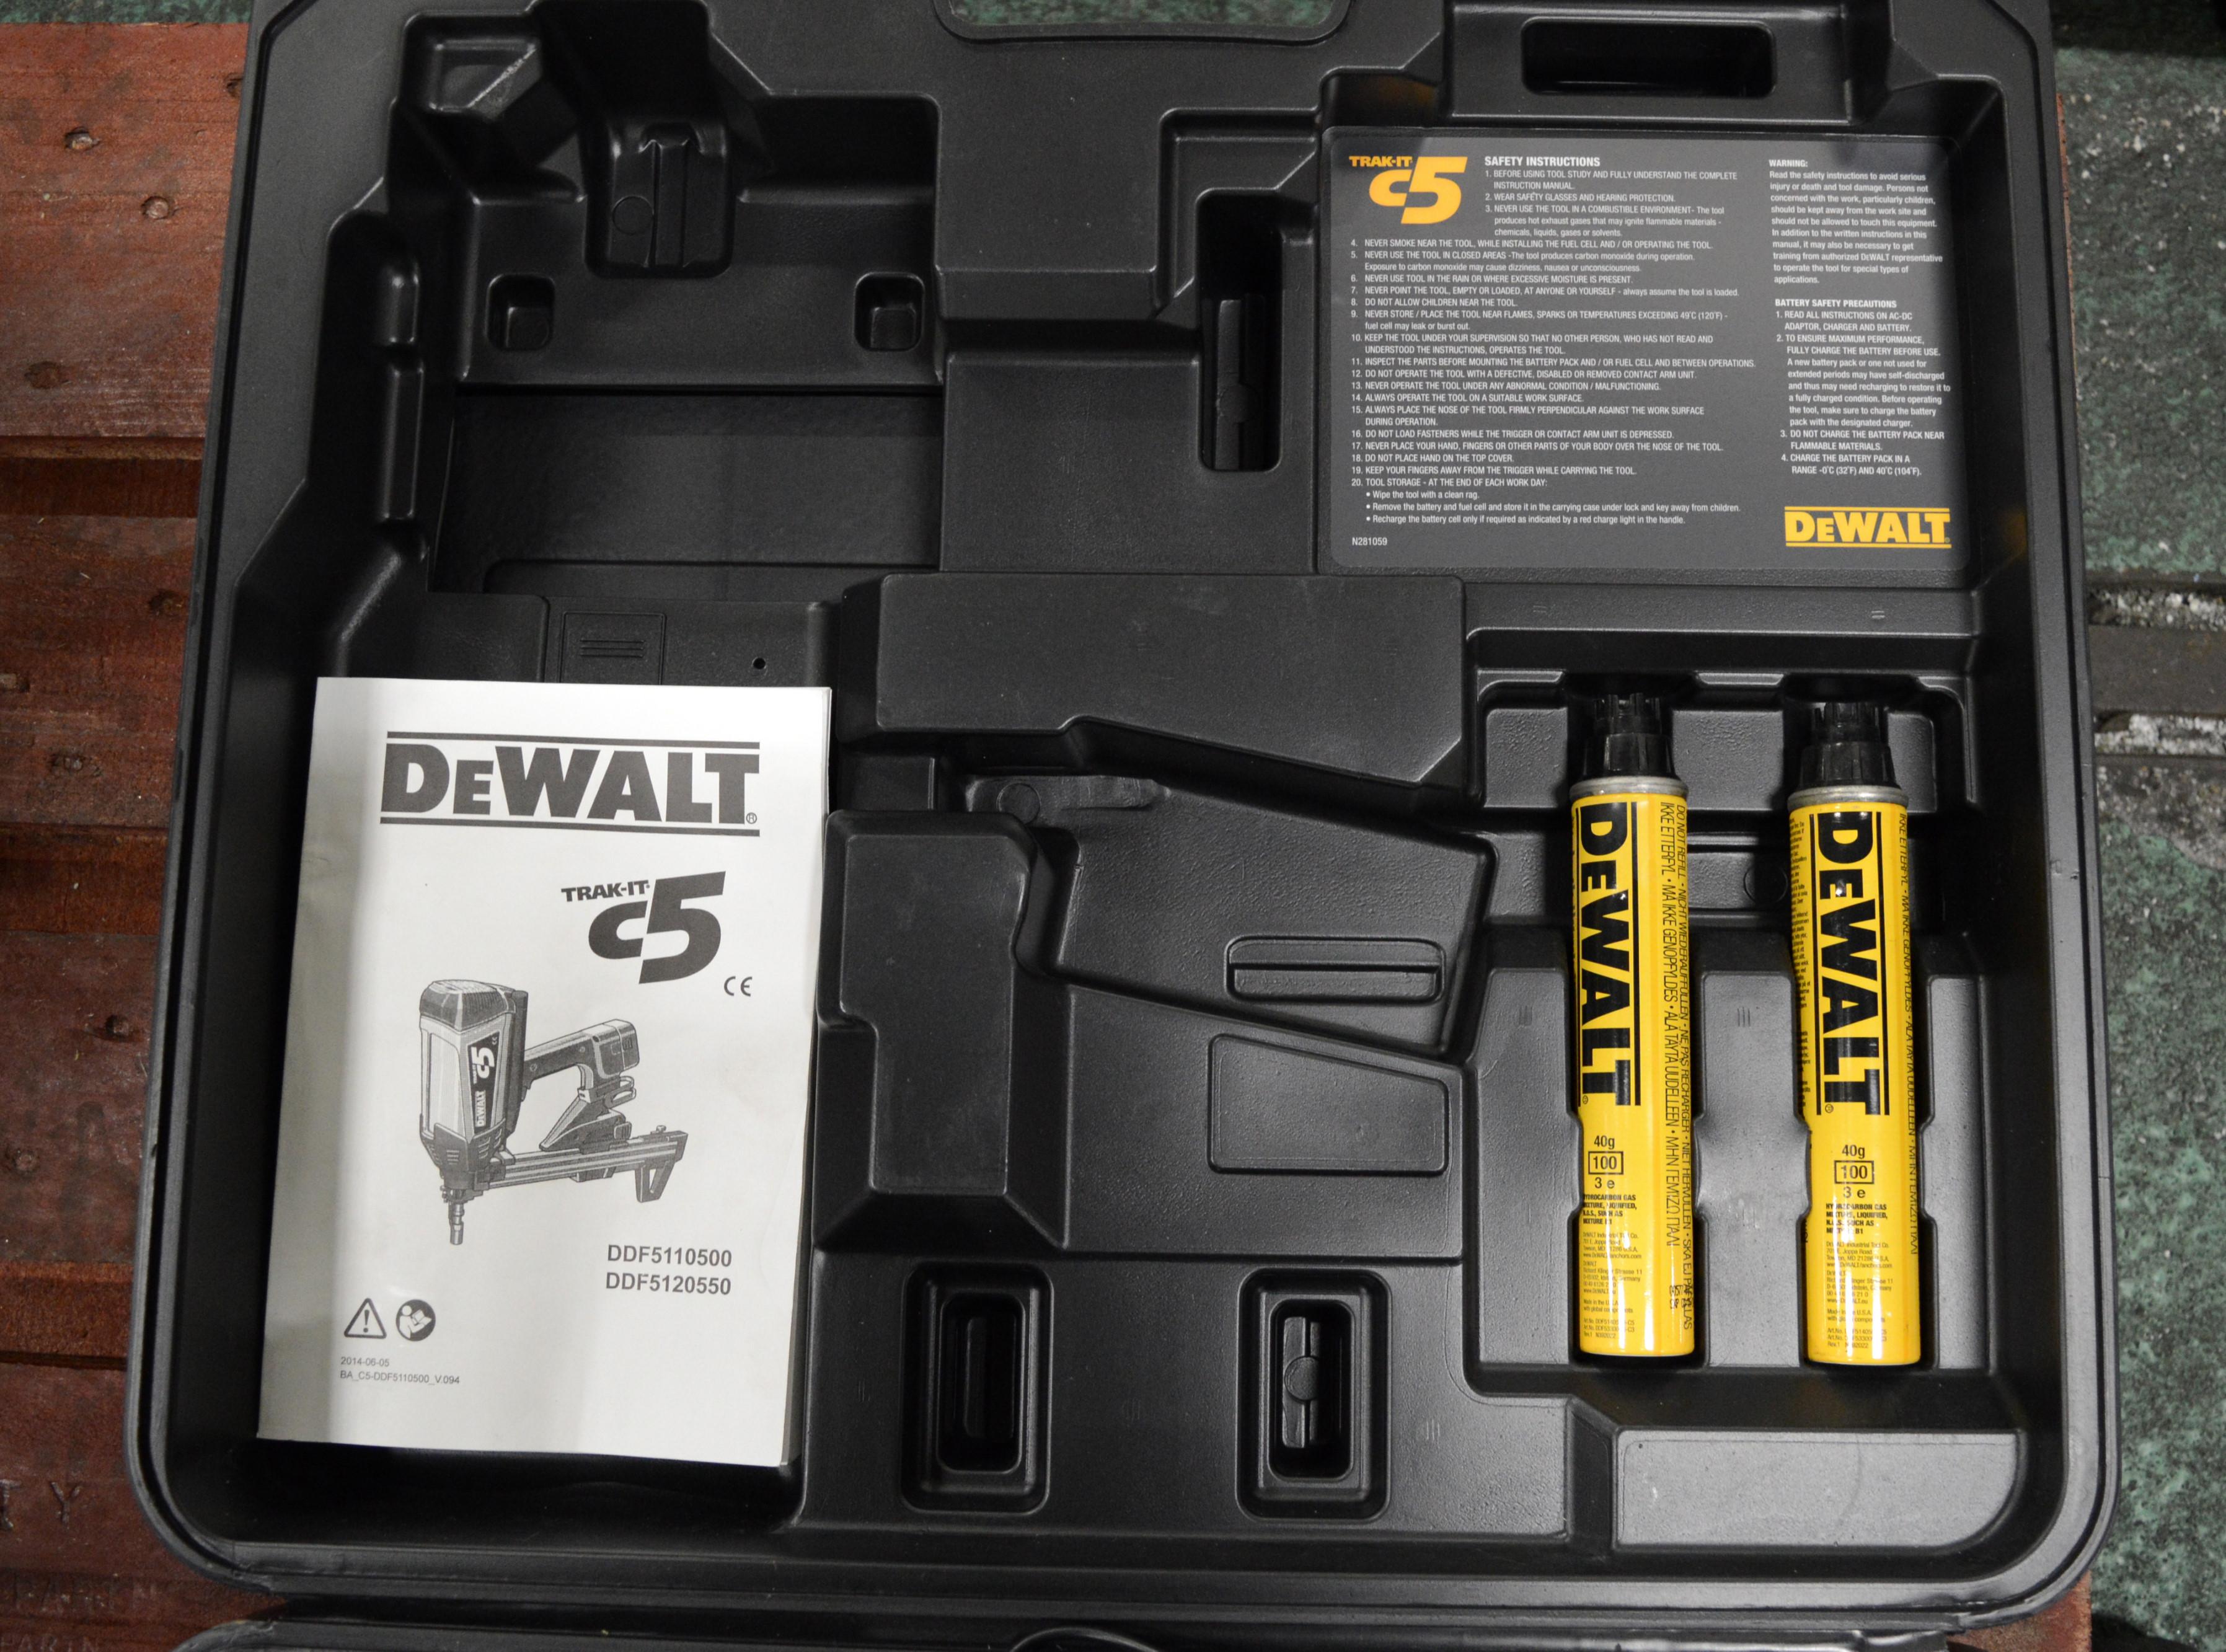 Lot 1722 - DeWalt C5 Trak-It Gas Actuated Nail Gun with Nails & Gas Cartridges.